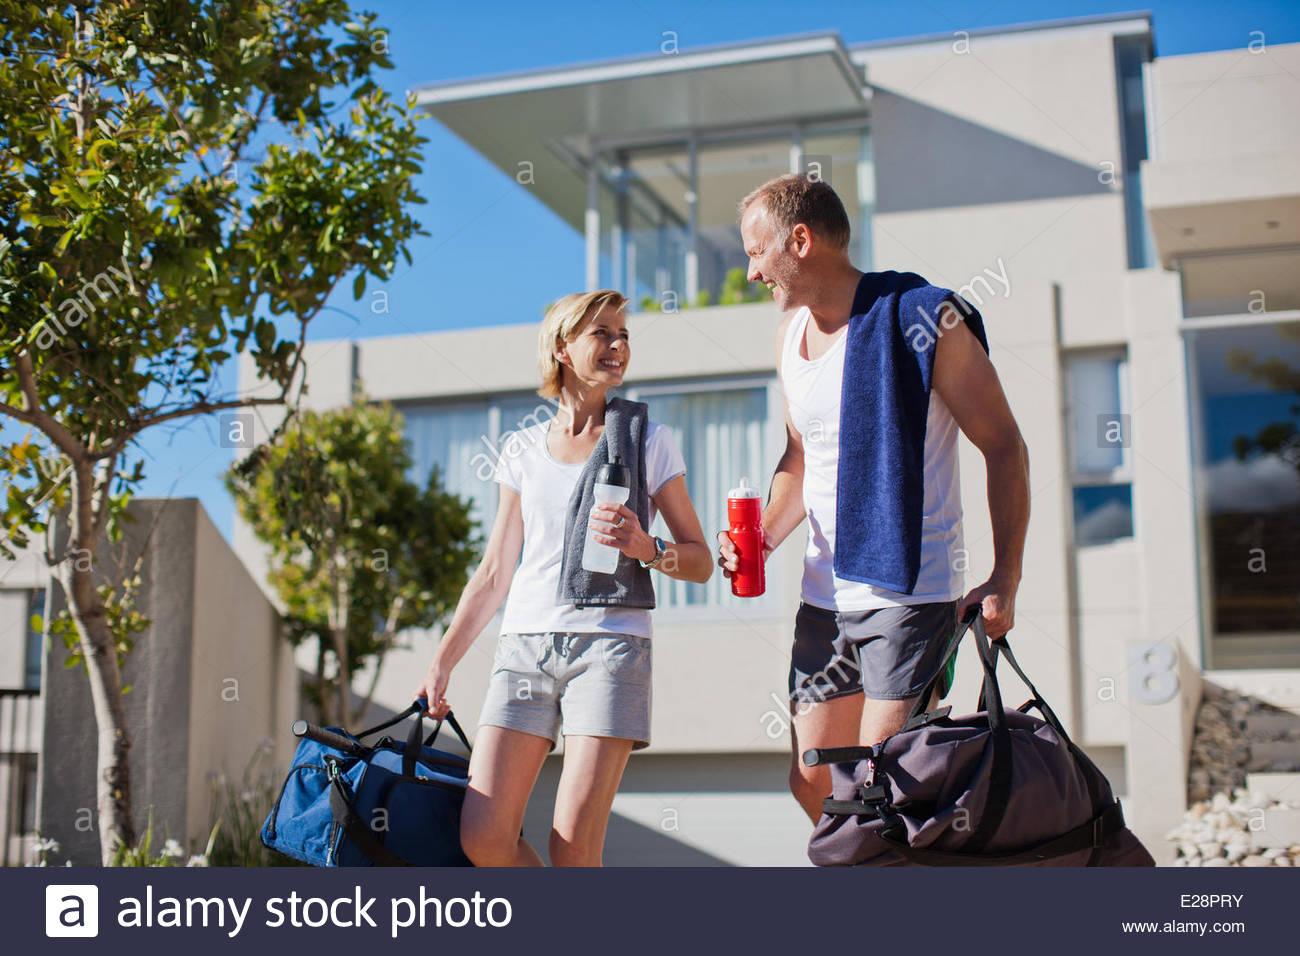 Couple preparing to exercise - Stock Image